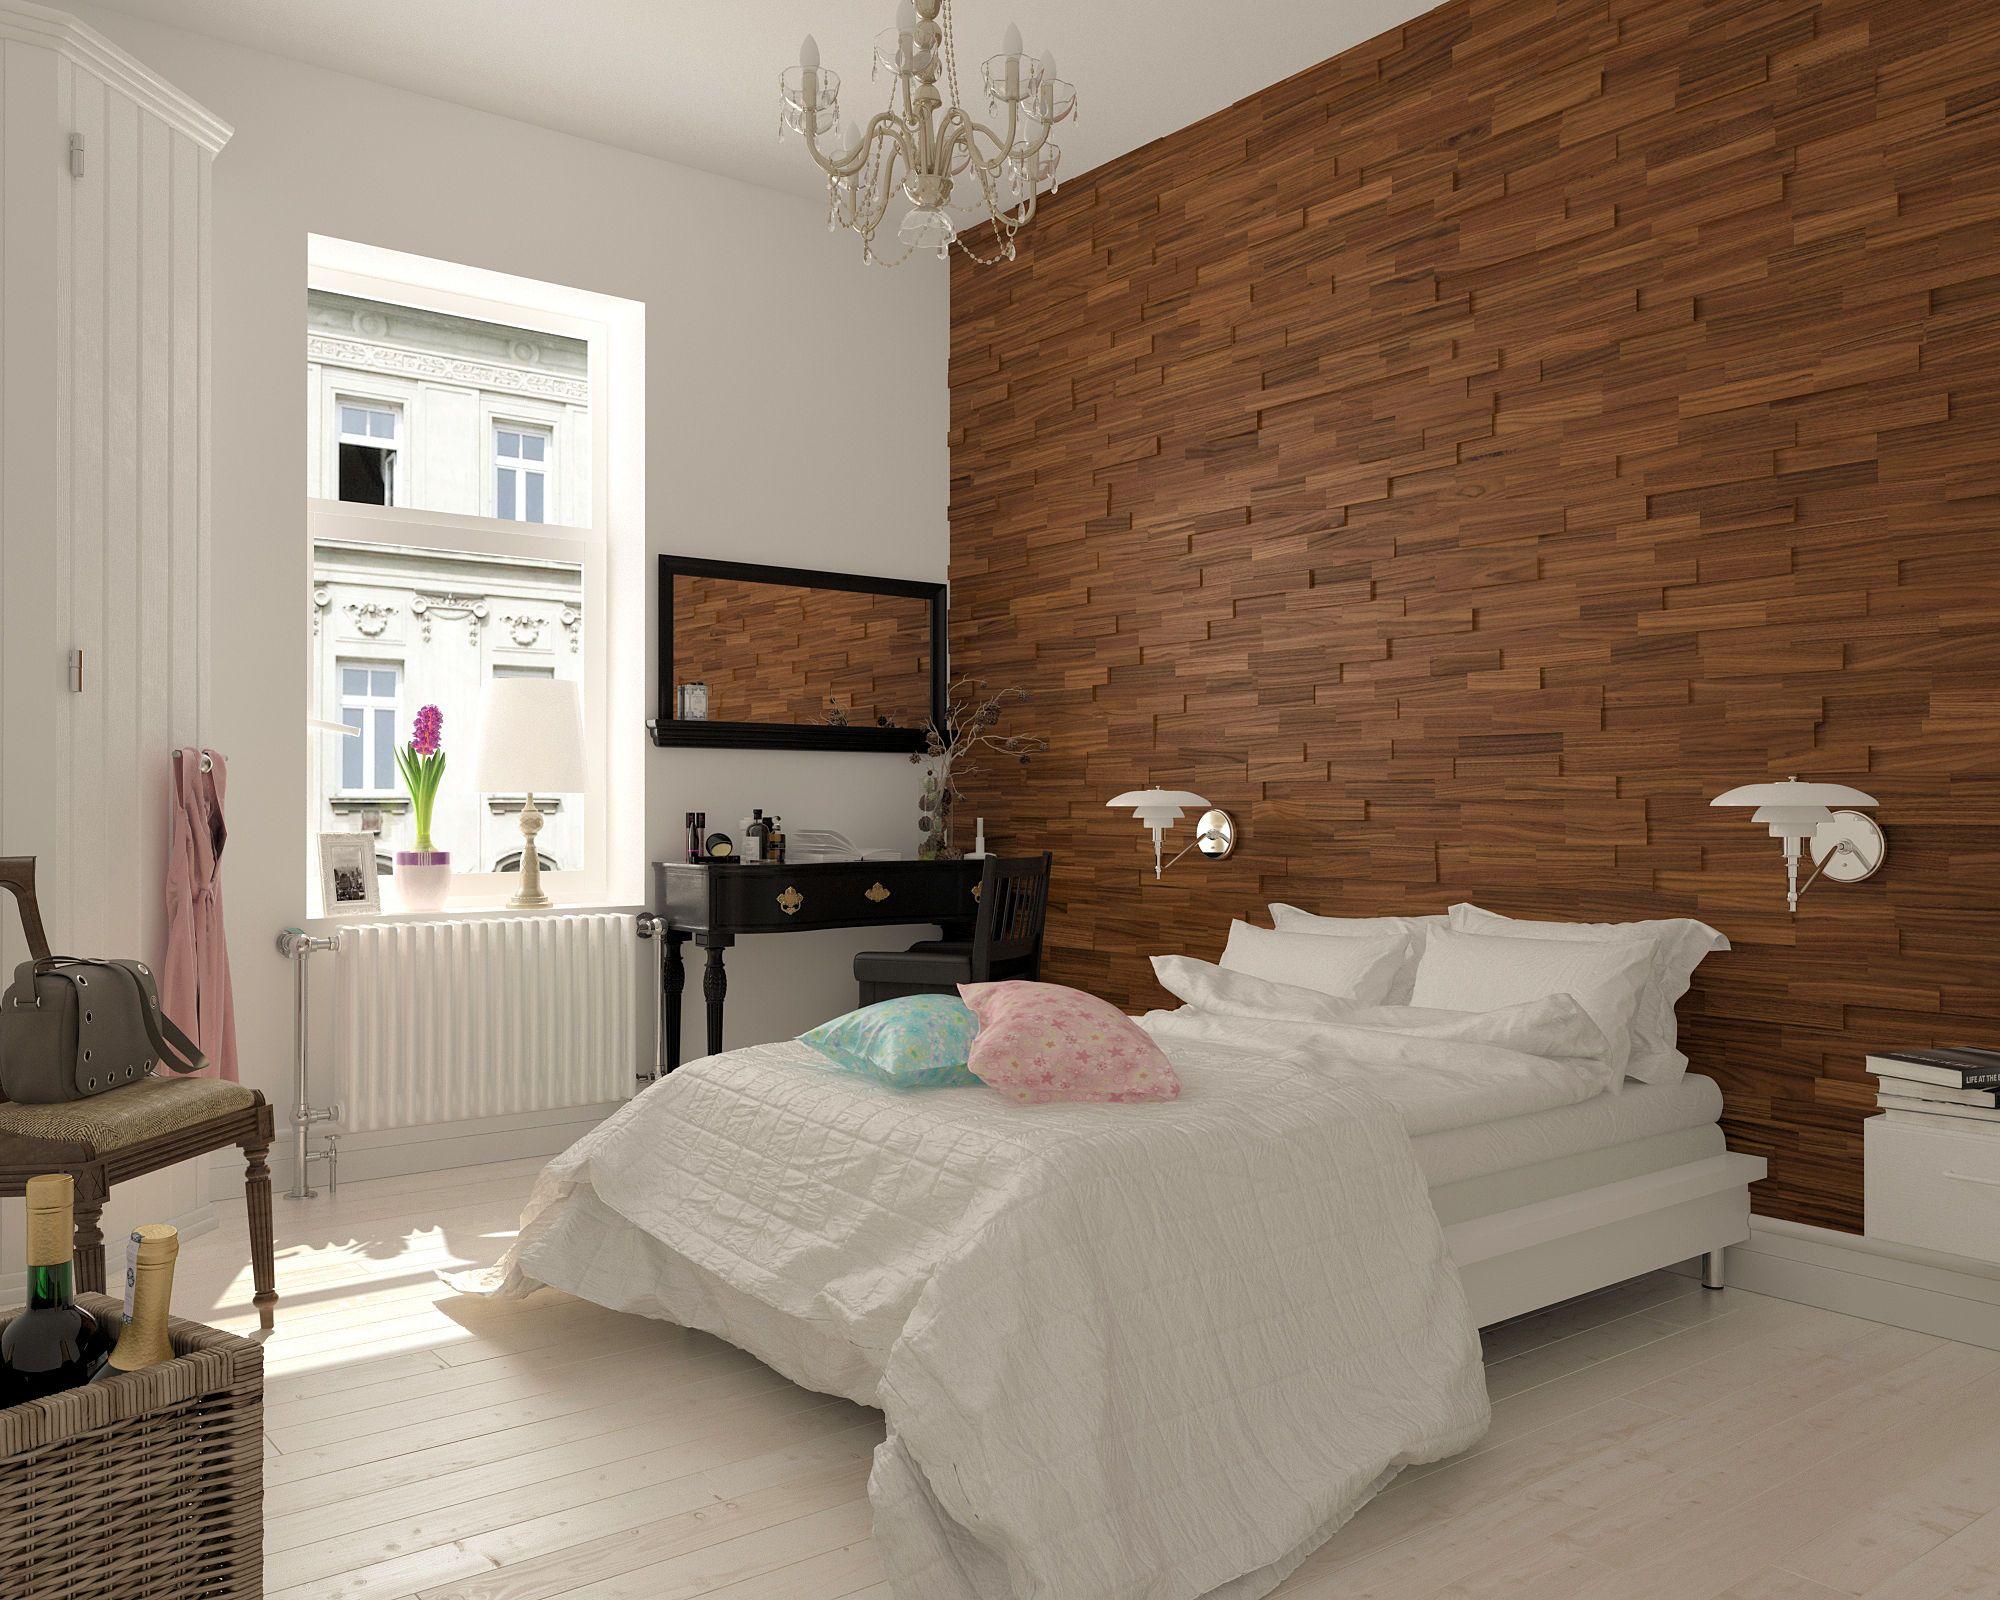 Wood Wall Paneling Real Wood Panels For Interior Walls Acacia Ac04 Wood Panel Walls Wall Panels Bedroom Wall Paneling